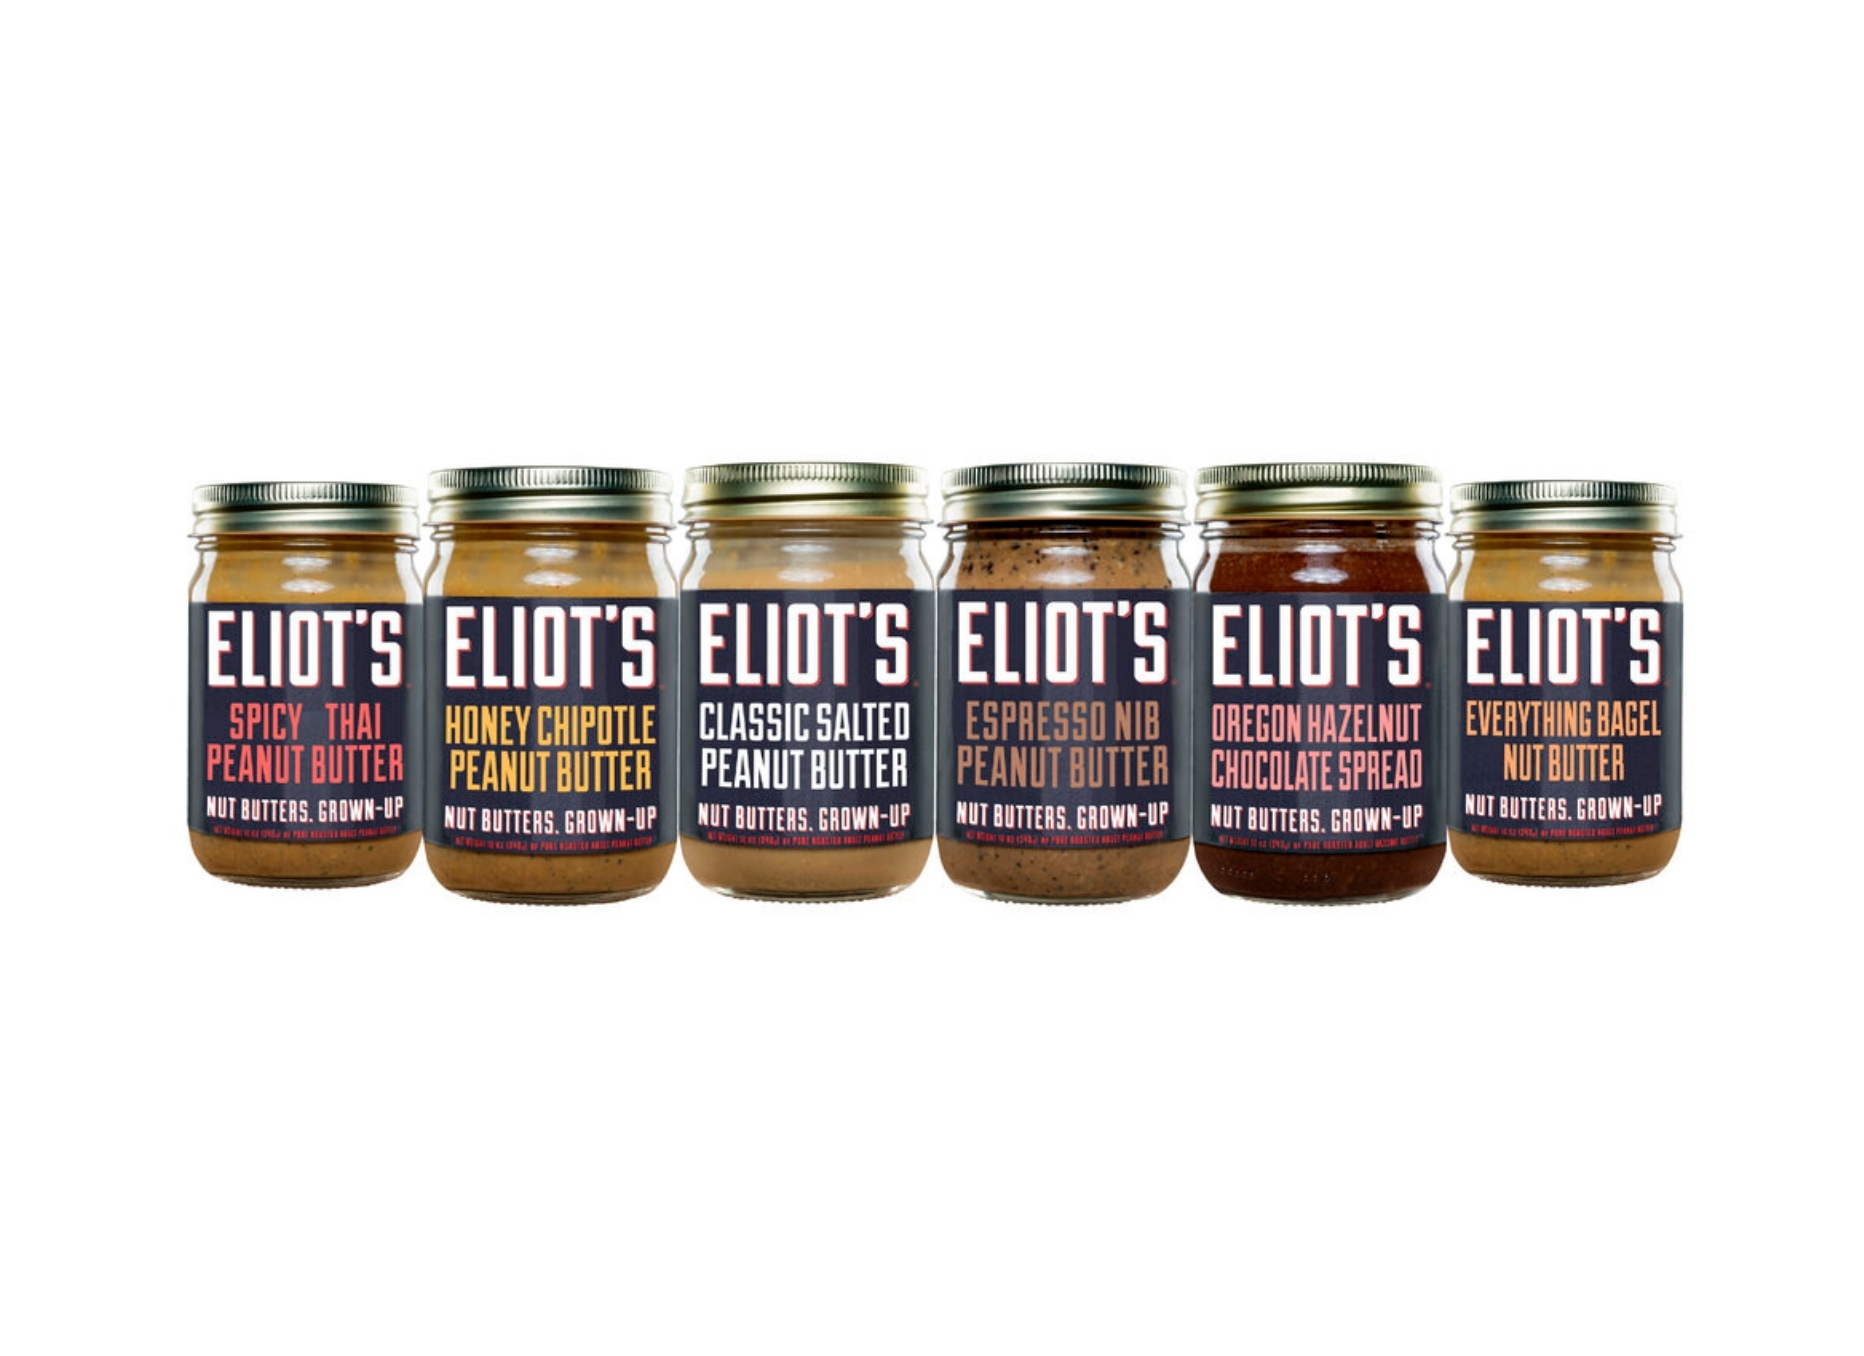 Eliot's Nut Butters